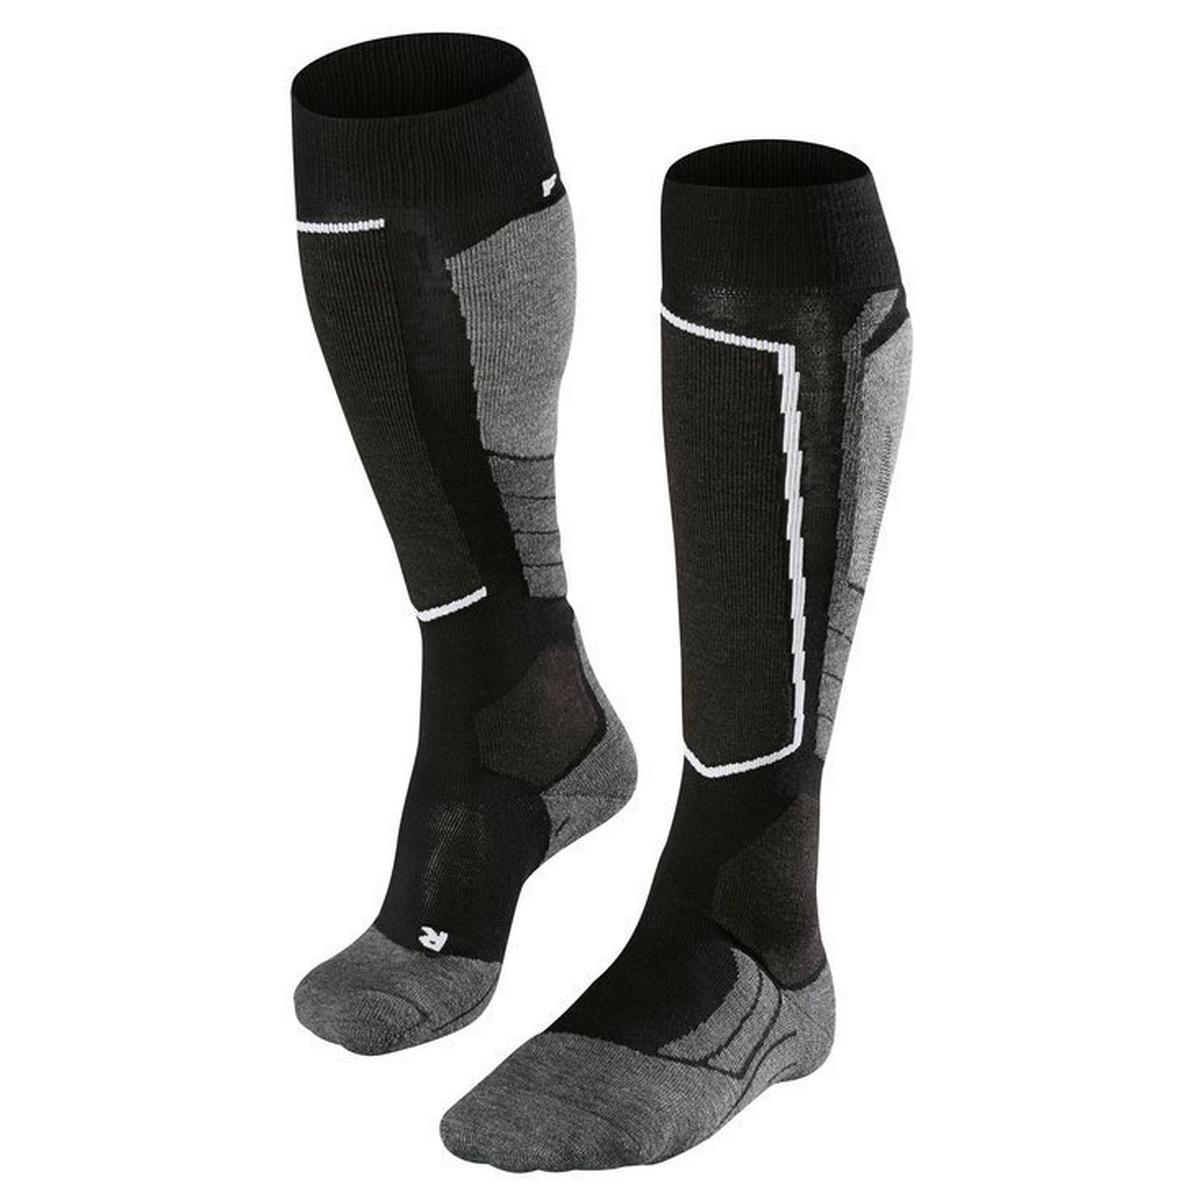 Falke Men's SK2 Wool Ski Sock